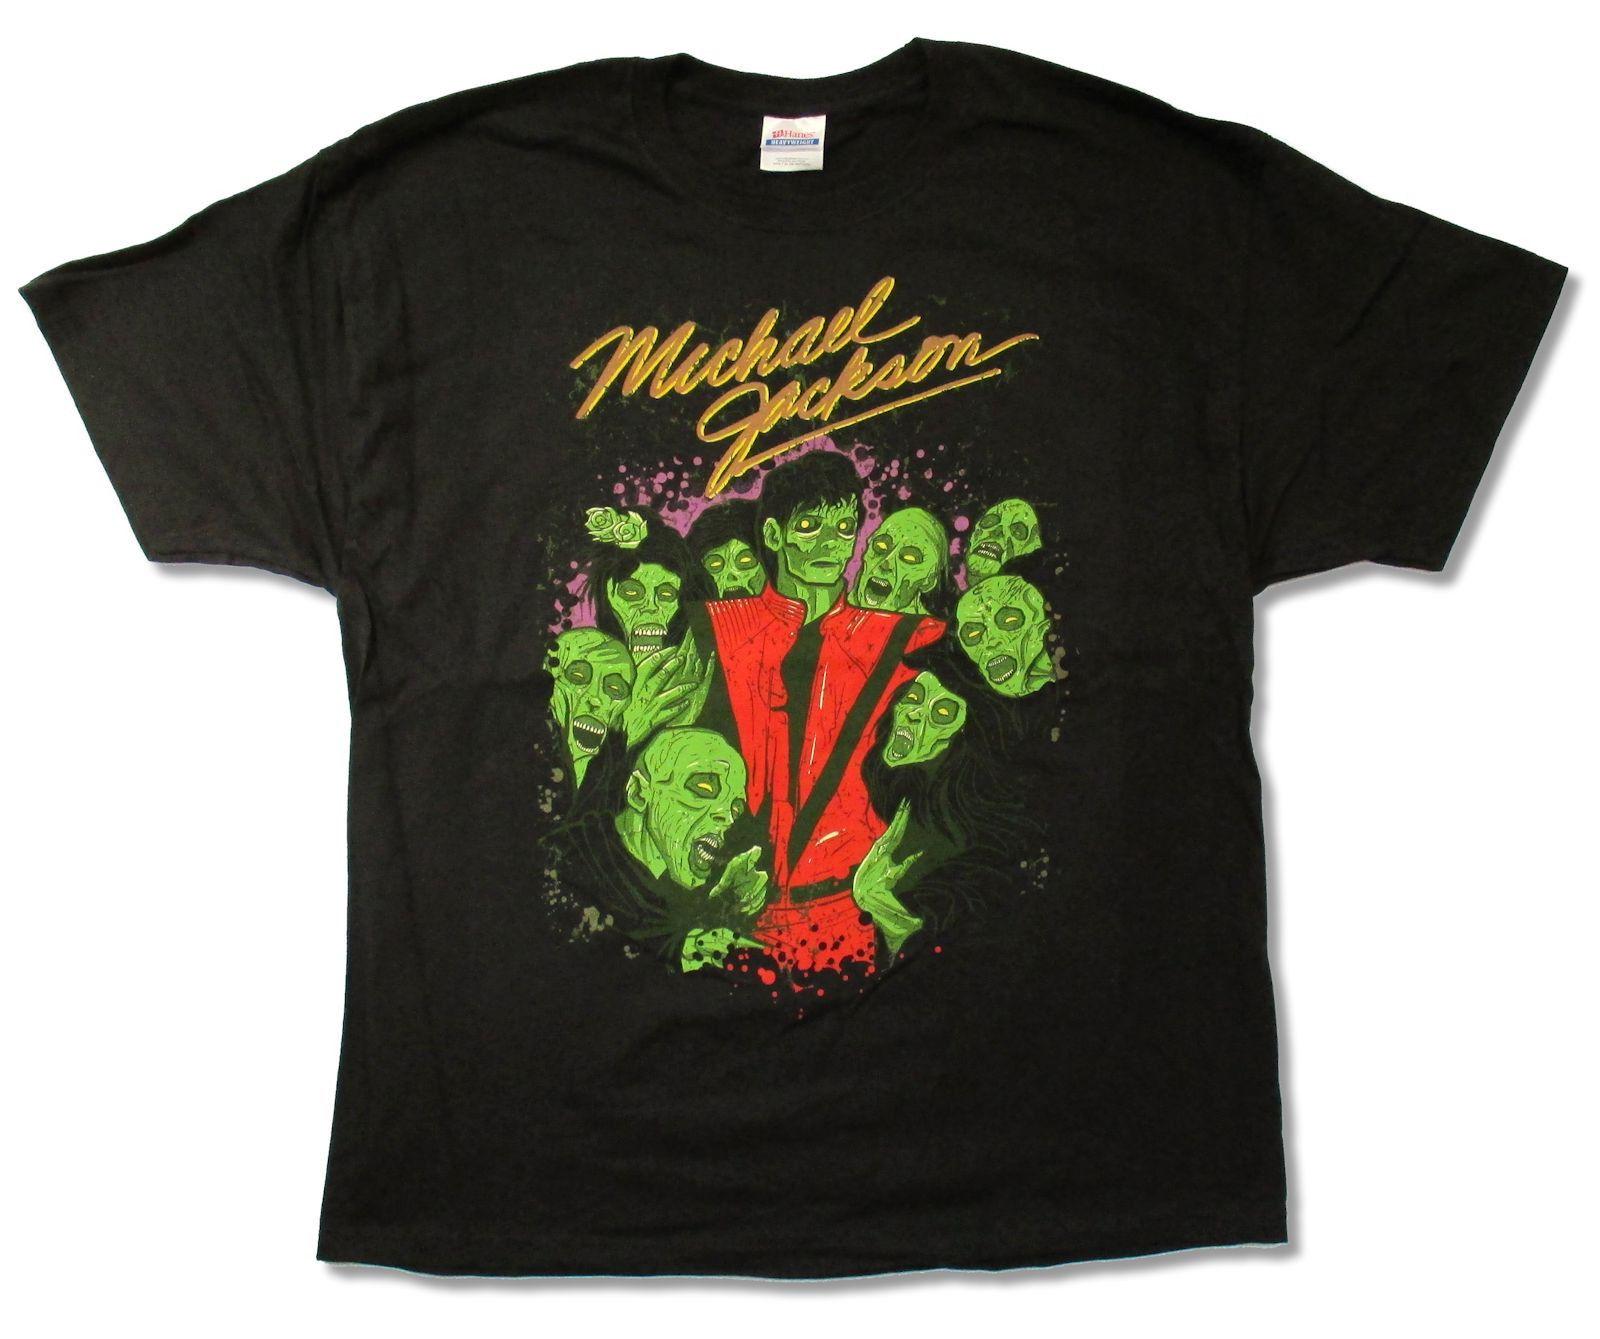 Michael jackson zombie crew thriller blk t camisa nova oficial jaqueta vermelha adulto 026297